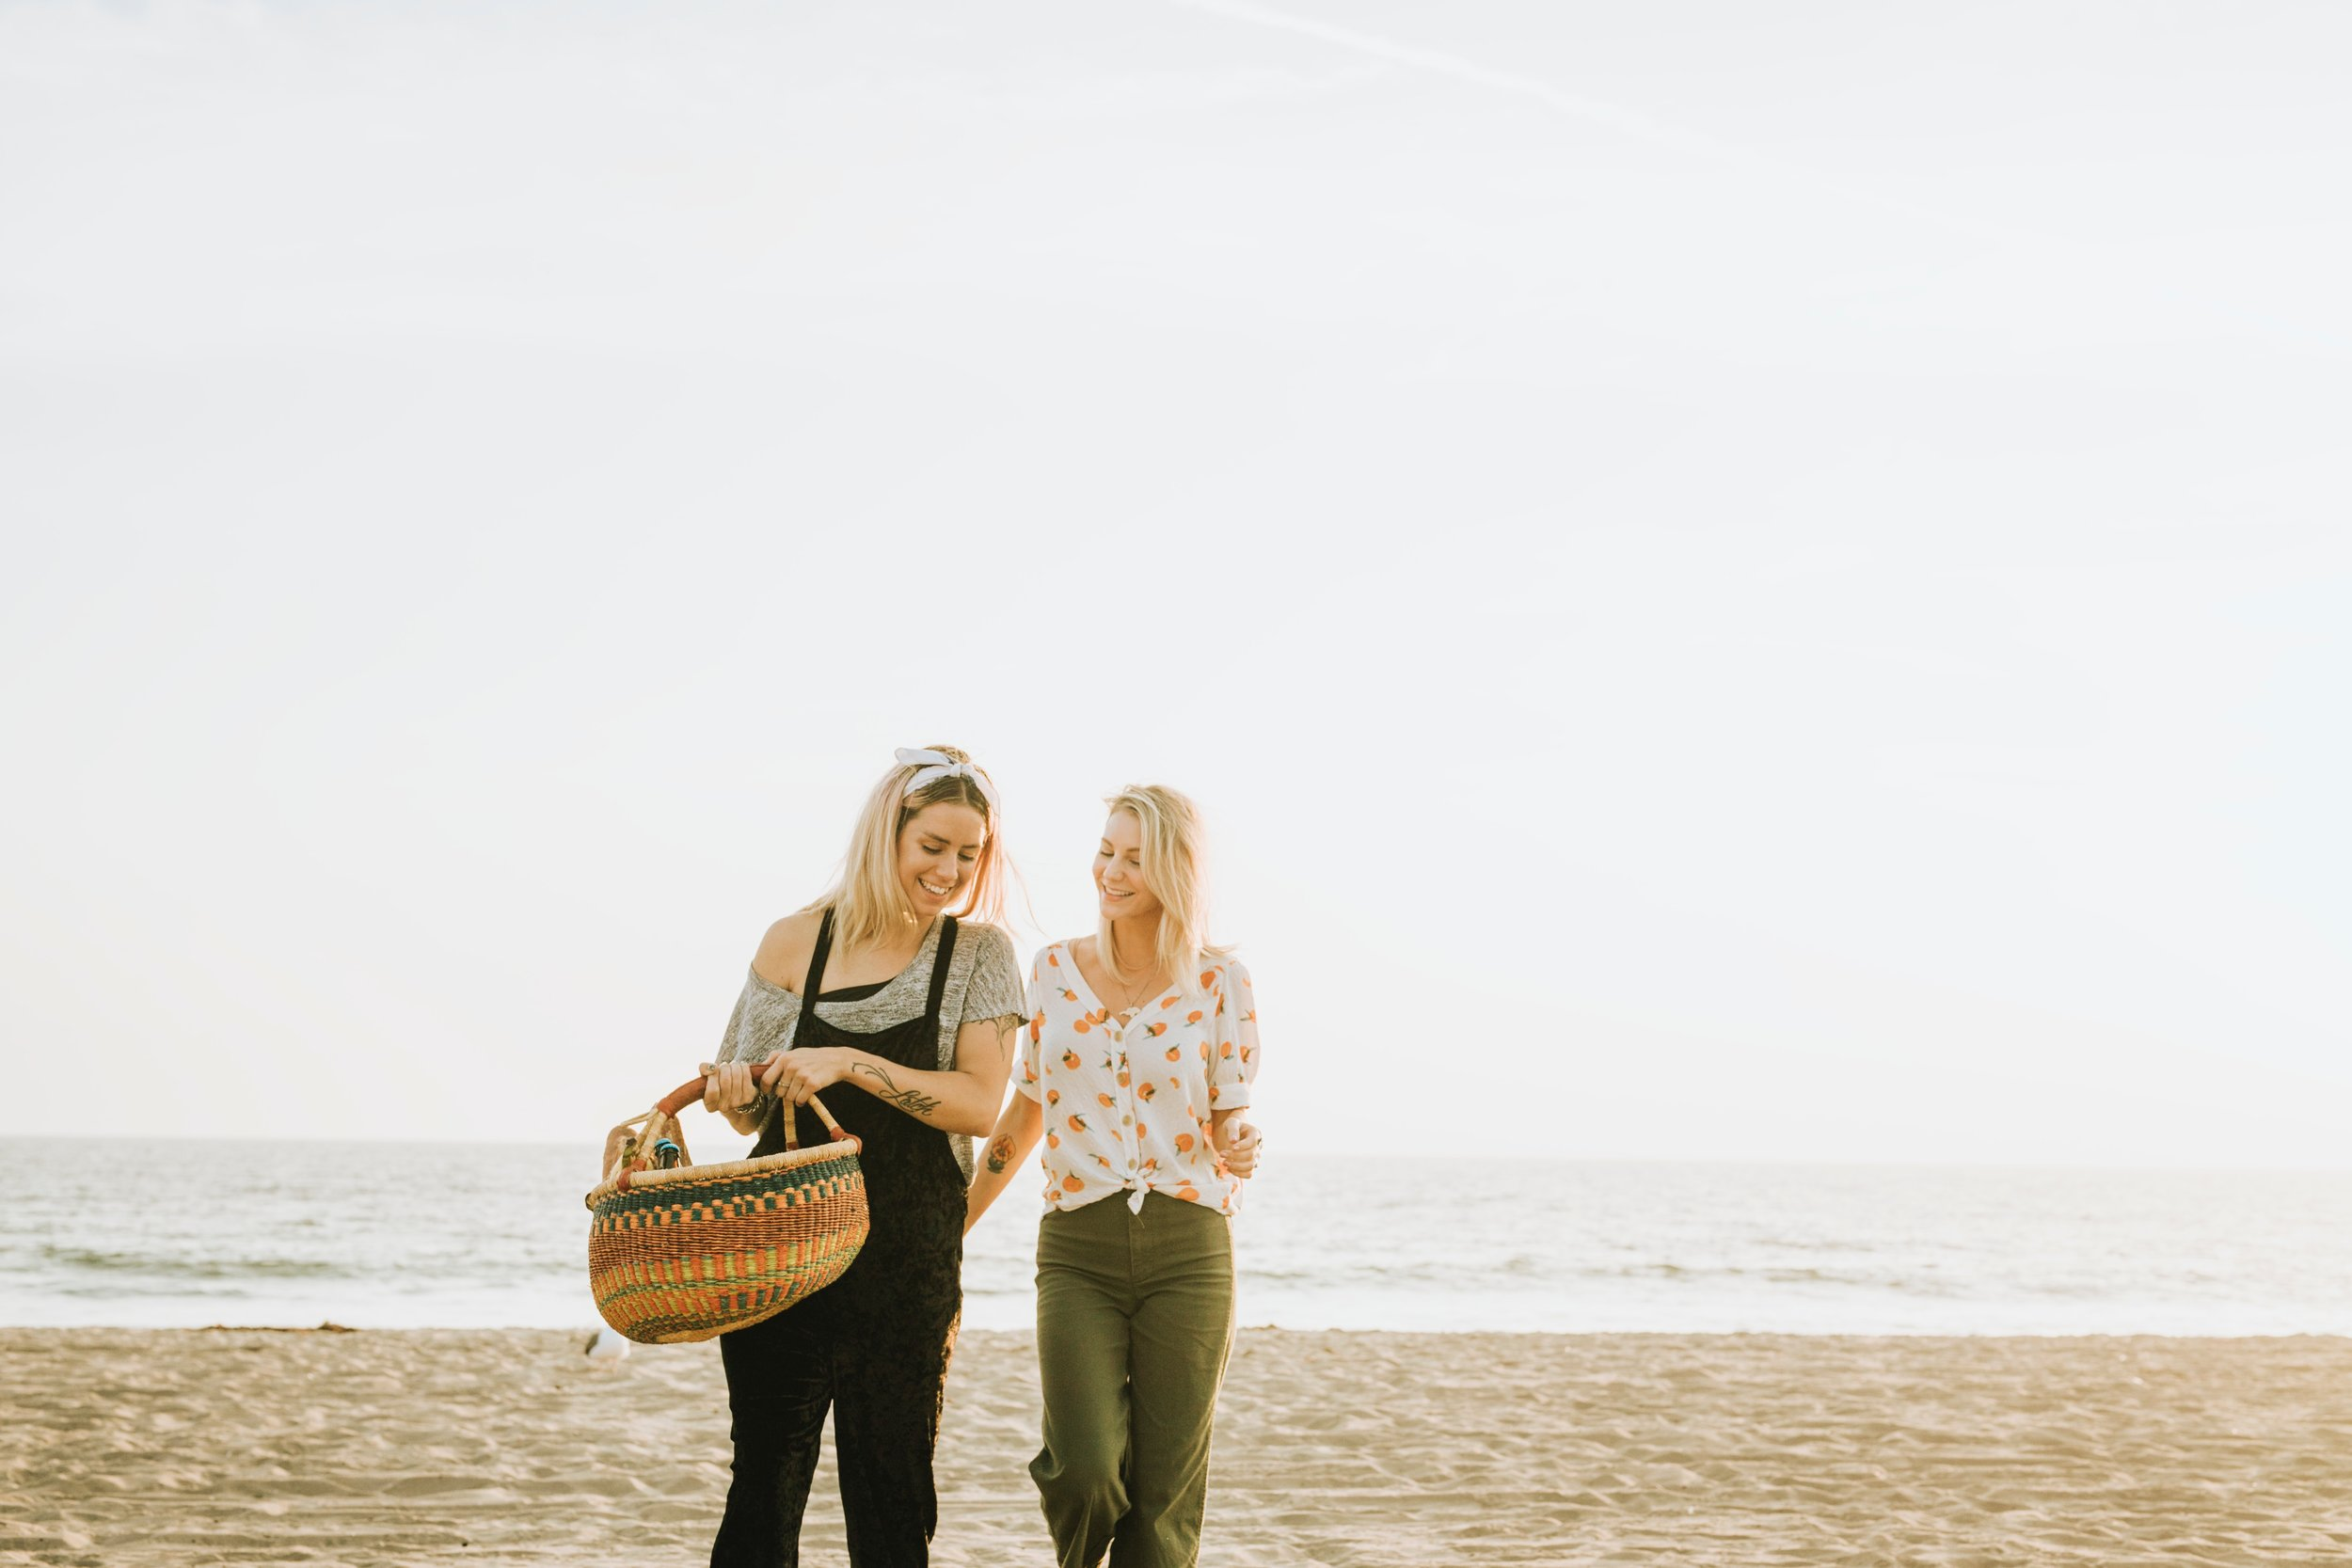 adults-beach-blonde-1520111.jpg